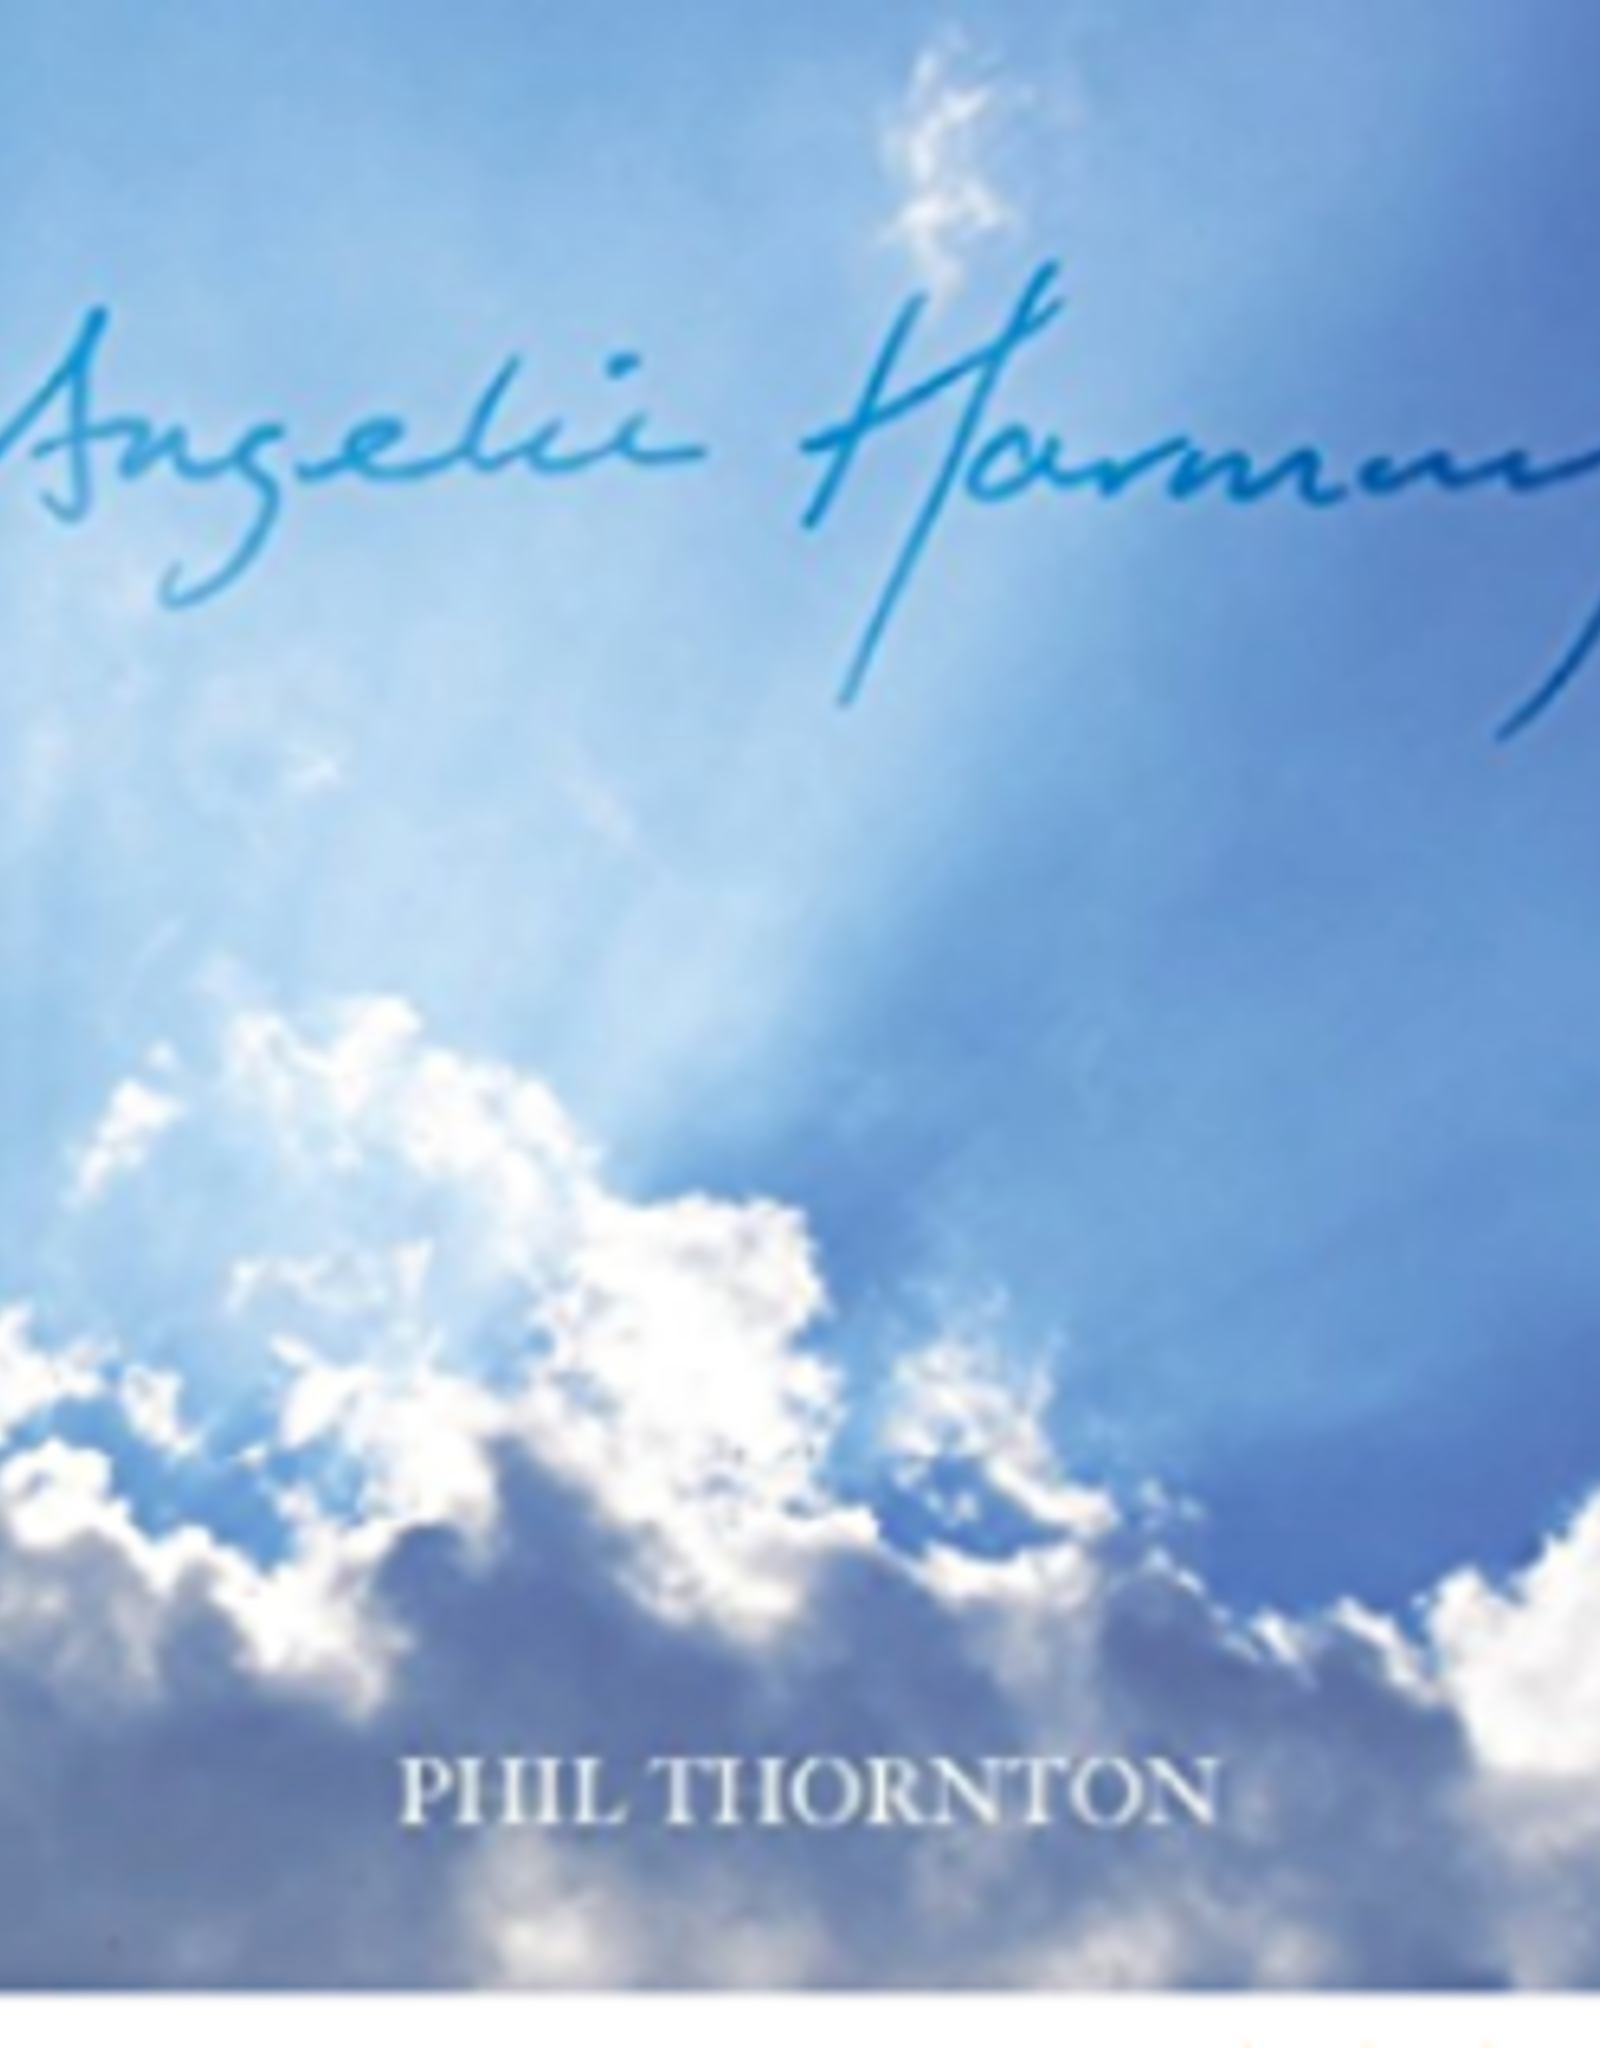 Phil Thornton Angelic Harmony CD by Phil Thornton